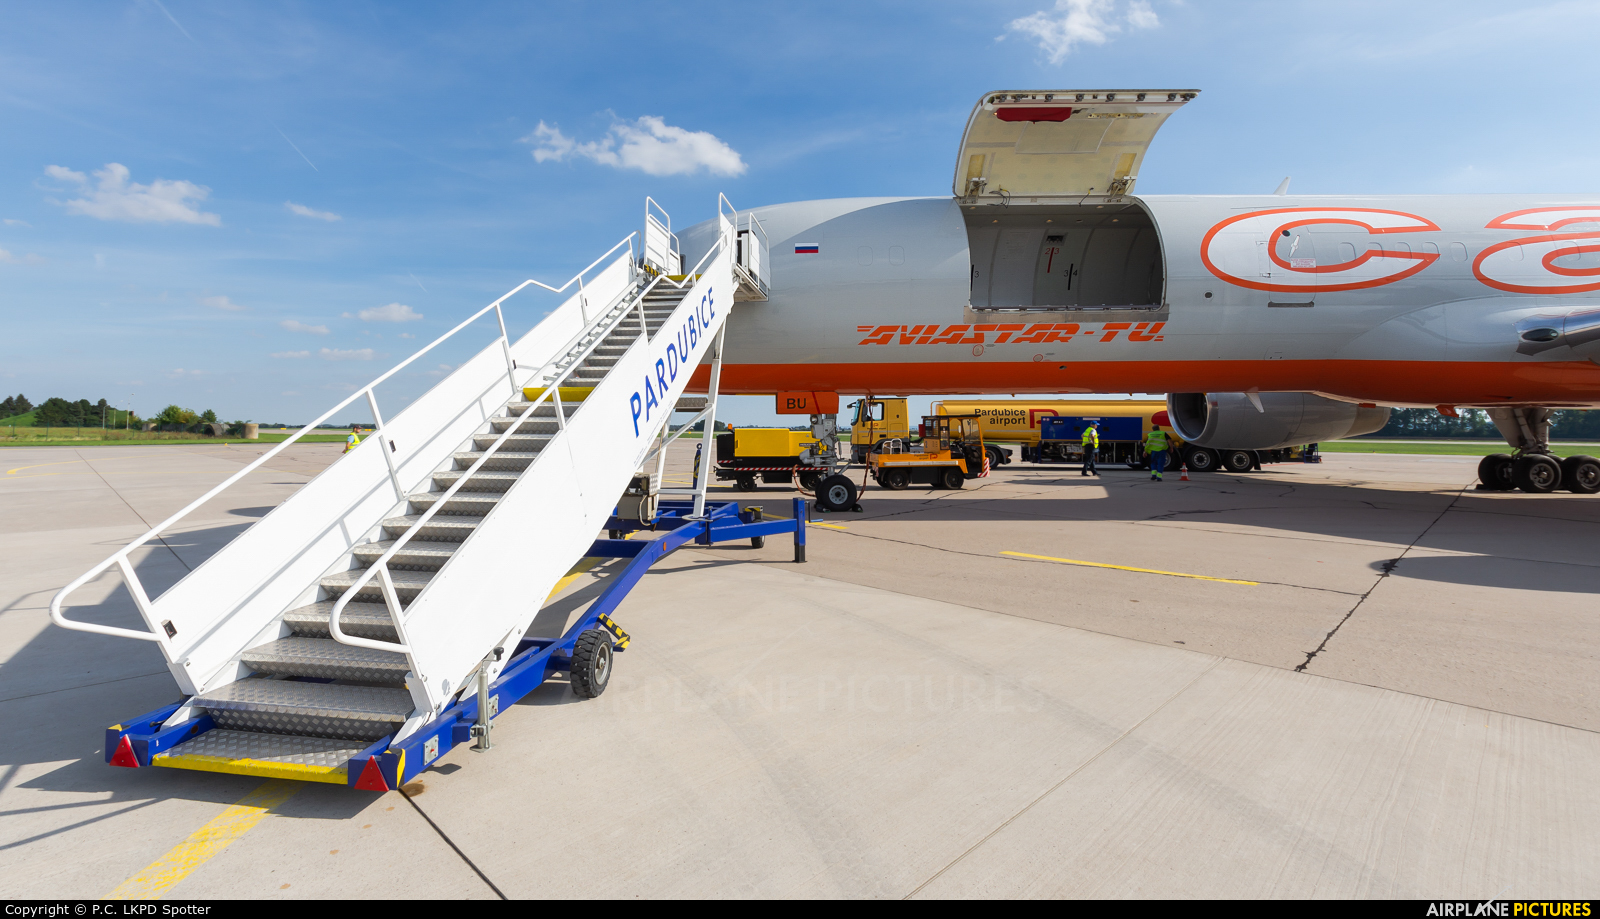 Aviastar-Tu VQ-BBU aircraft at Pardubice